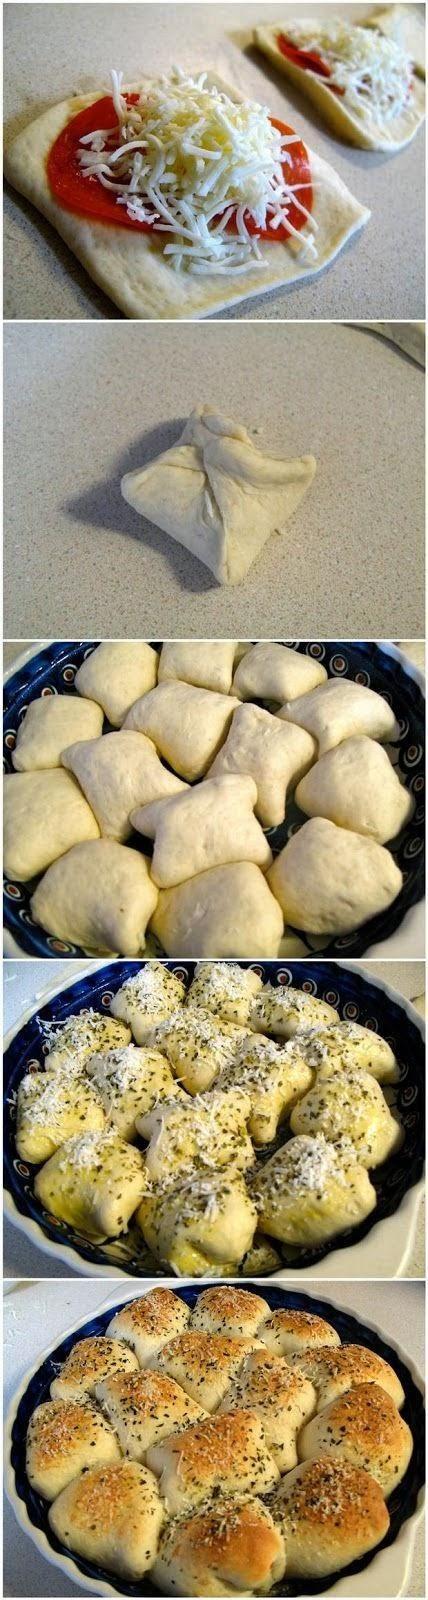 Super simple app - pizza rolls!